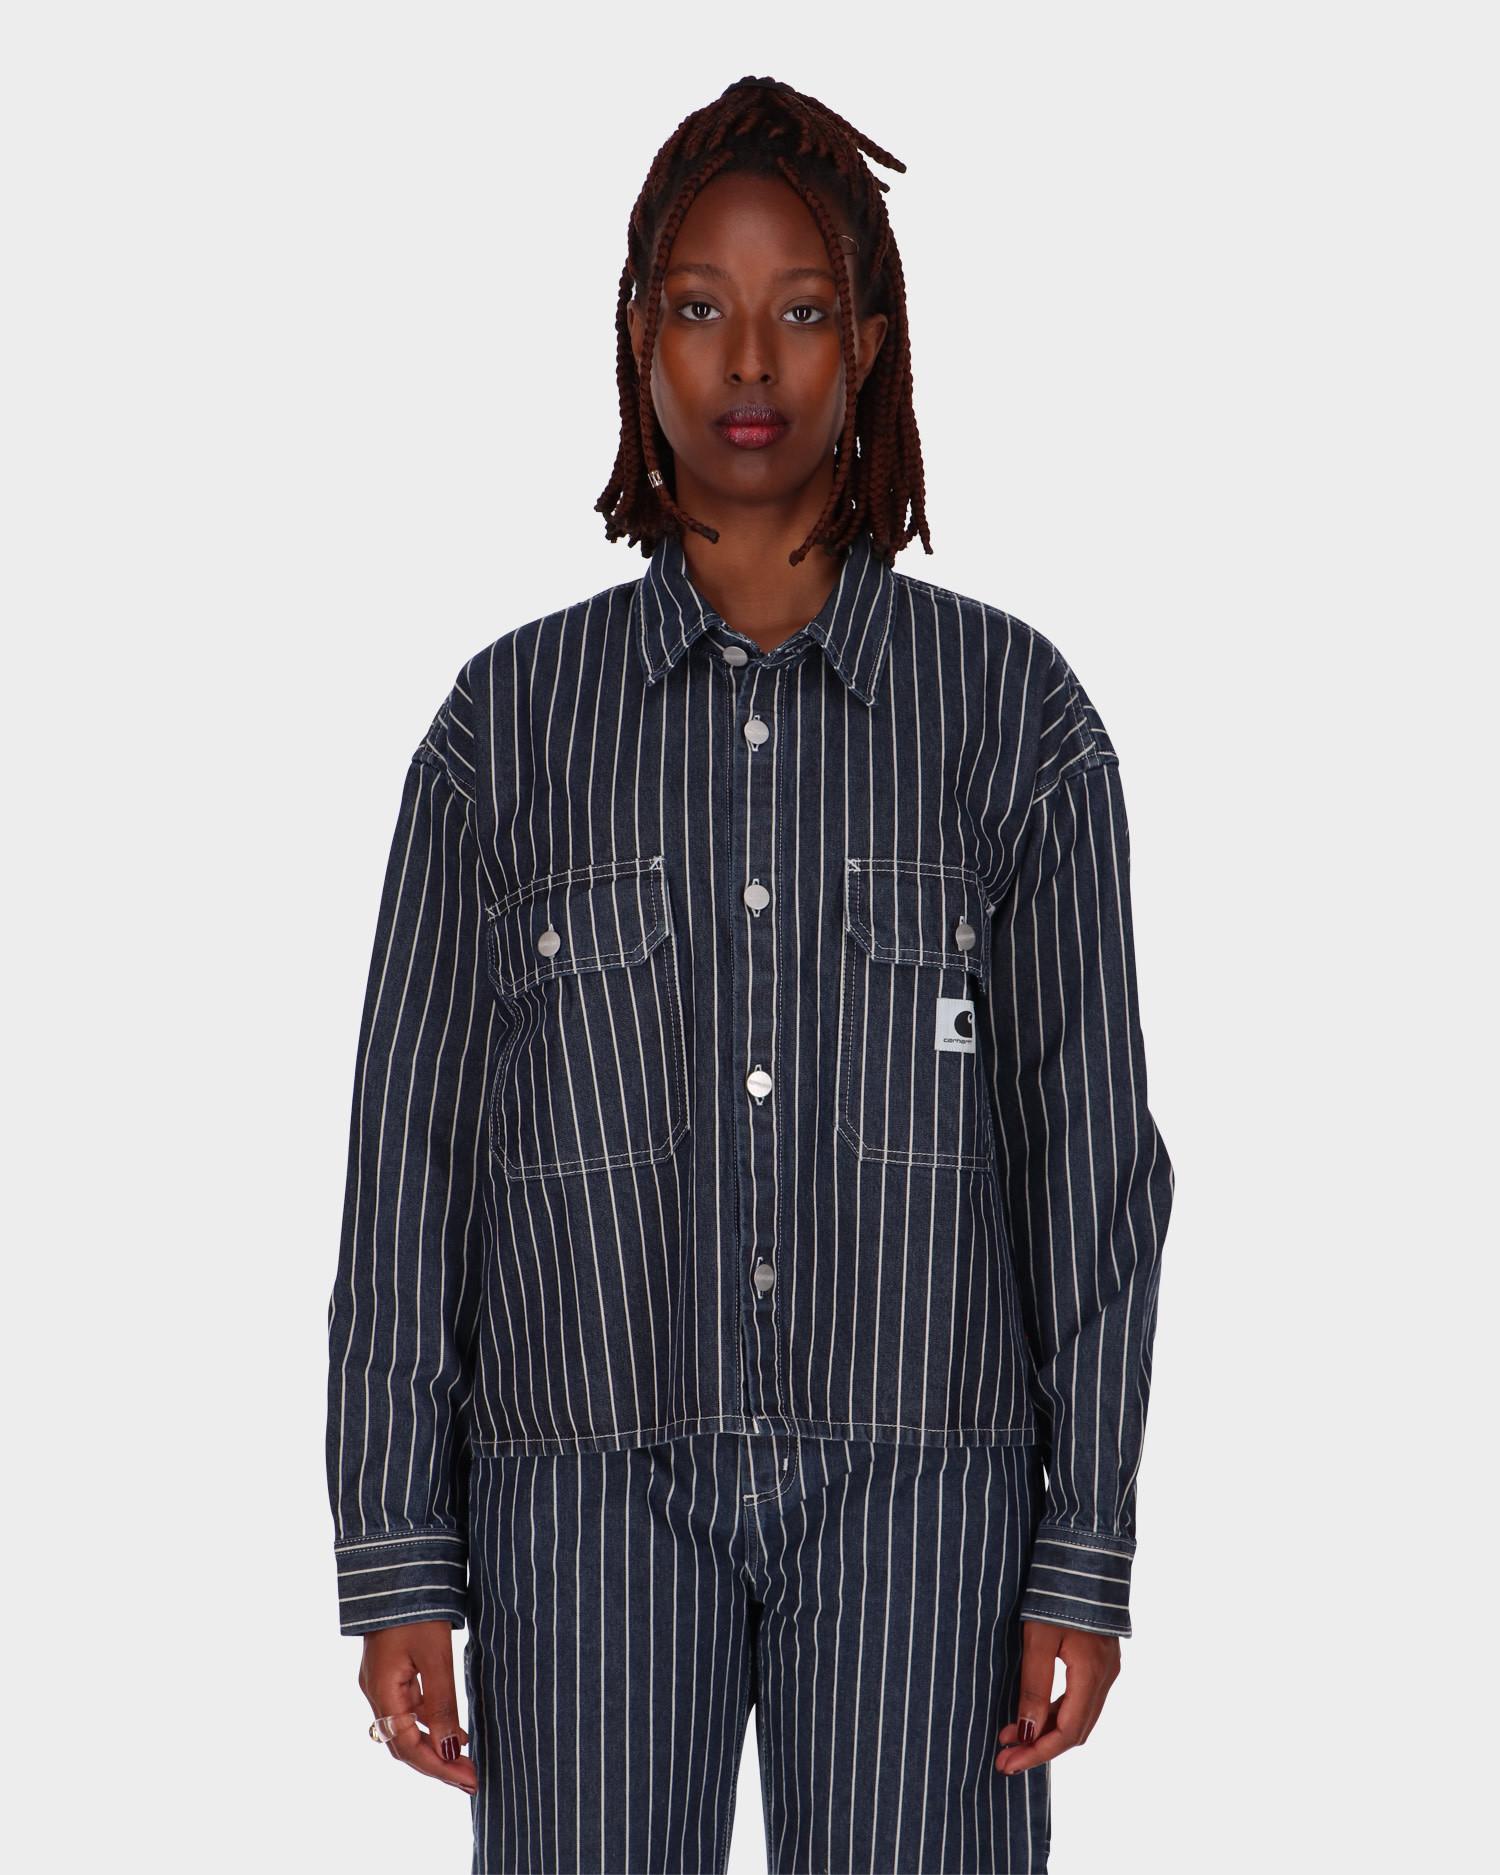 Carhartt W' Trade Longsleeve Shirt Dark Navy/Wax Rinsed